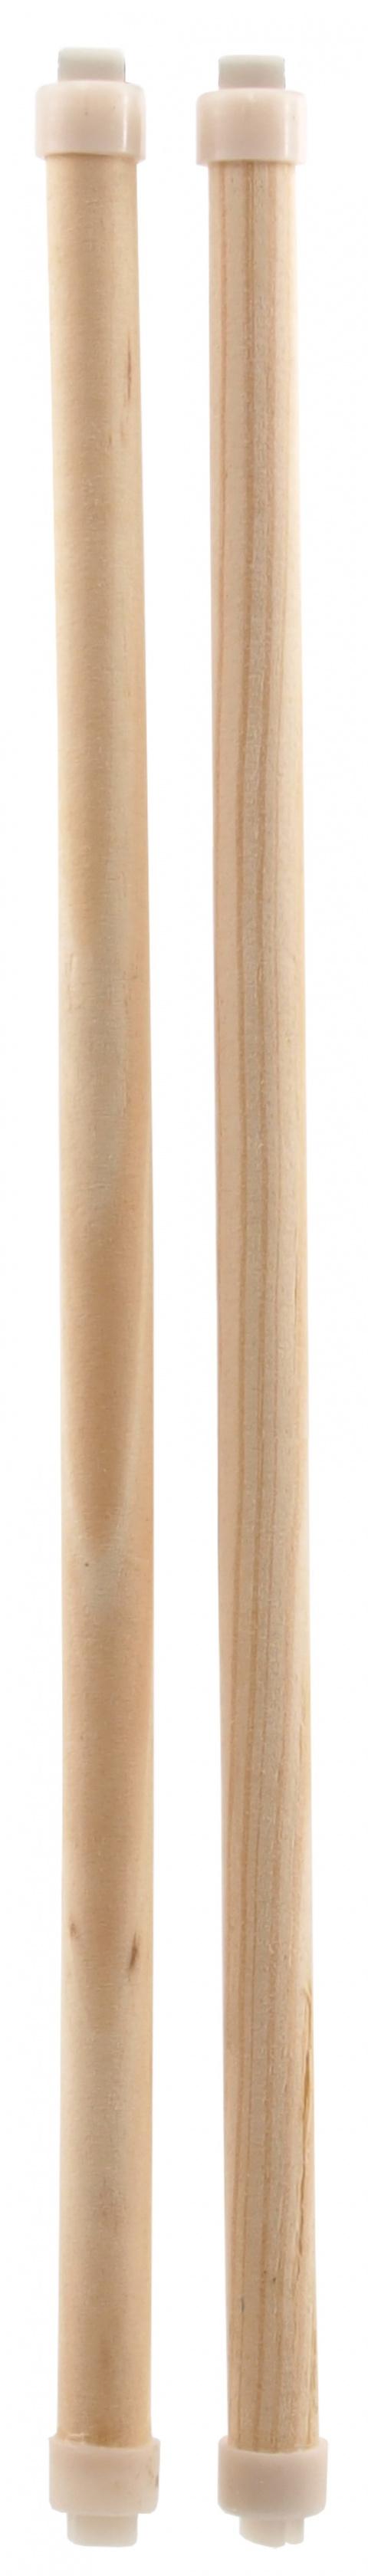 Деревянные жердочки для птиц - BIRD JEWEL 40,6 cm (2 шт) title=